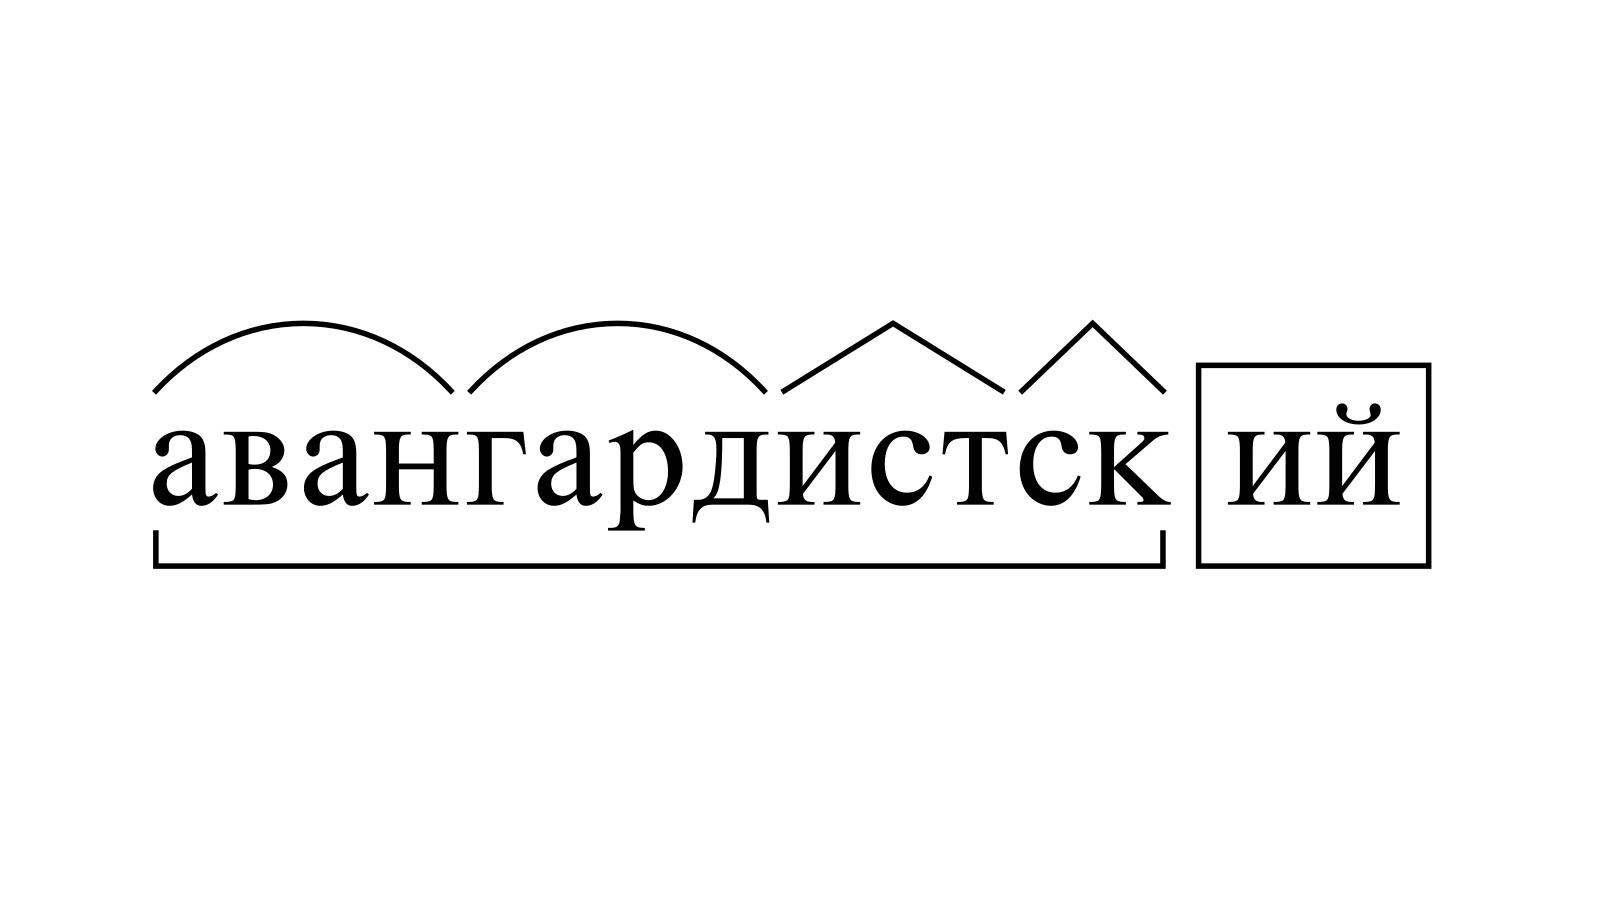 Разбор слова «авангардистский» по составу